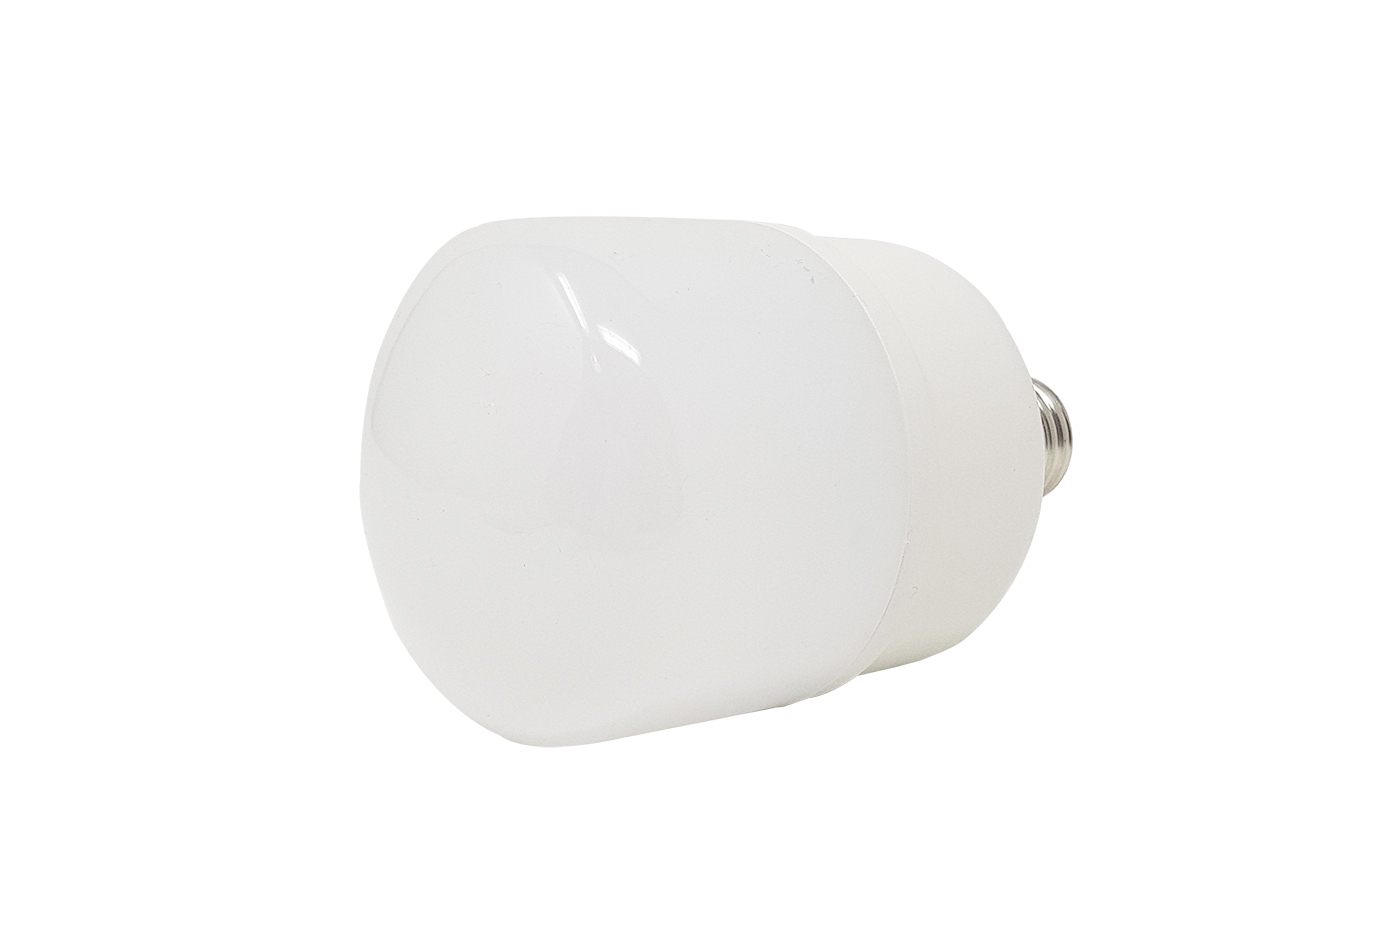 Lampada Led Lunga.Lampada Led 25 W Watt Luce Fredda Alta Luminosita E27 Lampadina Lm Bulb 25w Dr